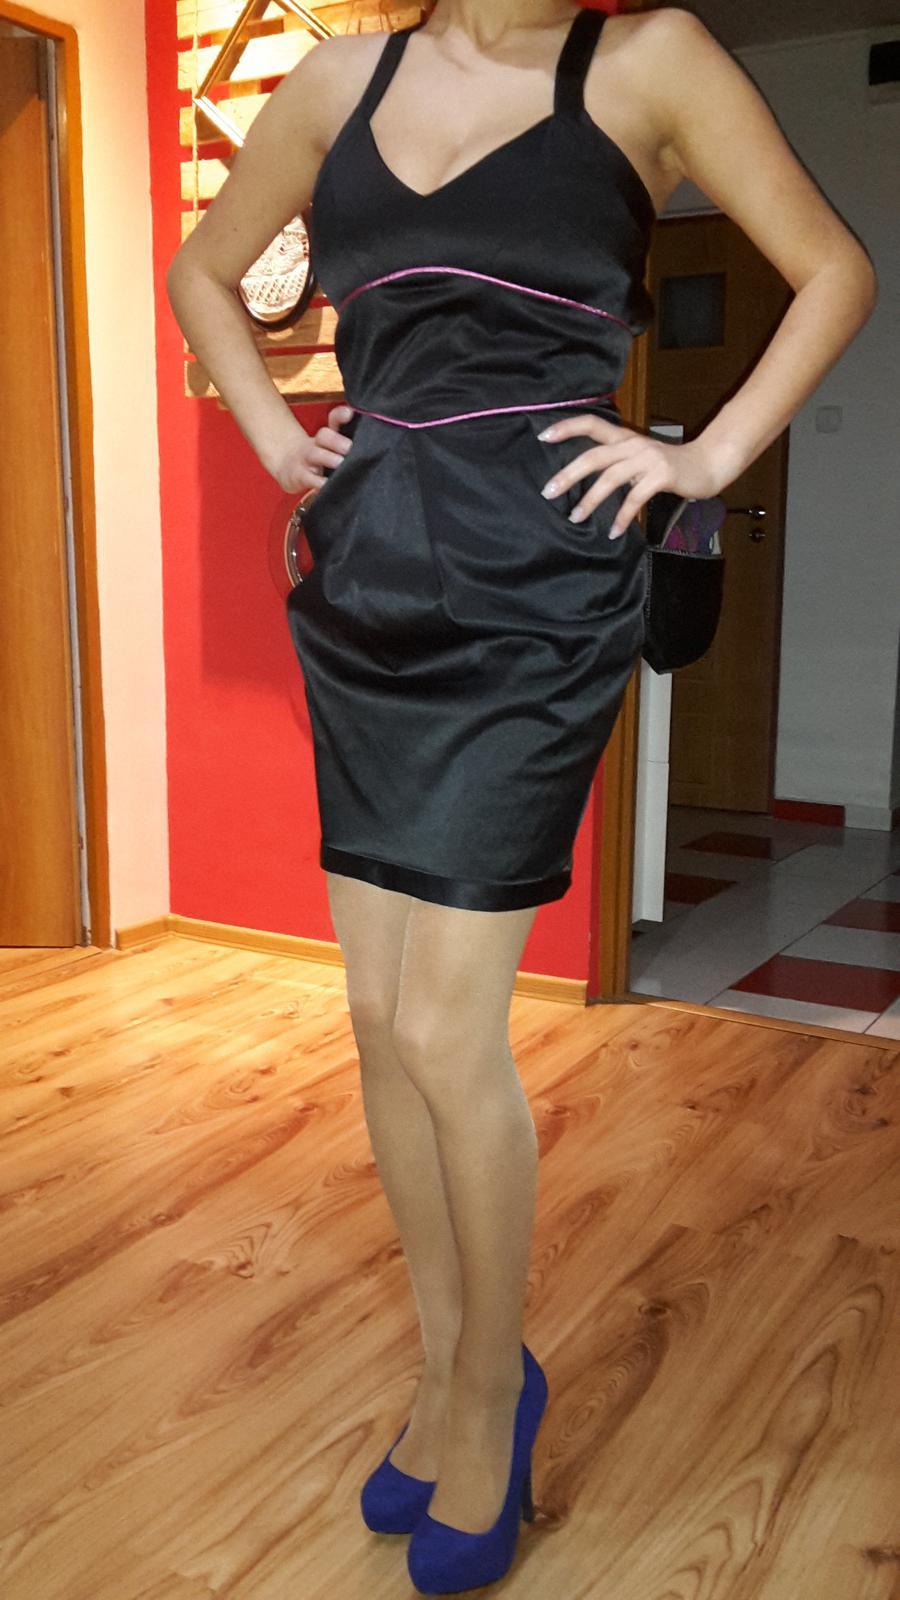 Kvalitné a sexi šaty - Obrázok č. 1